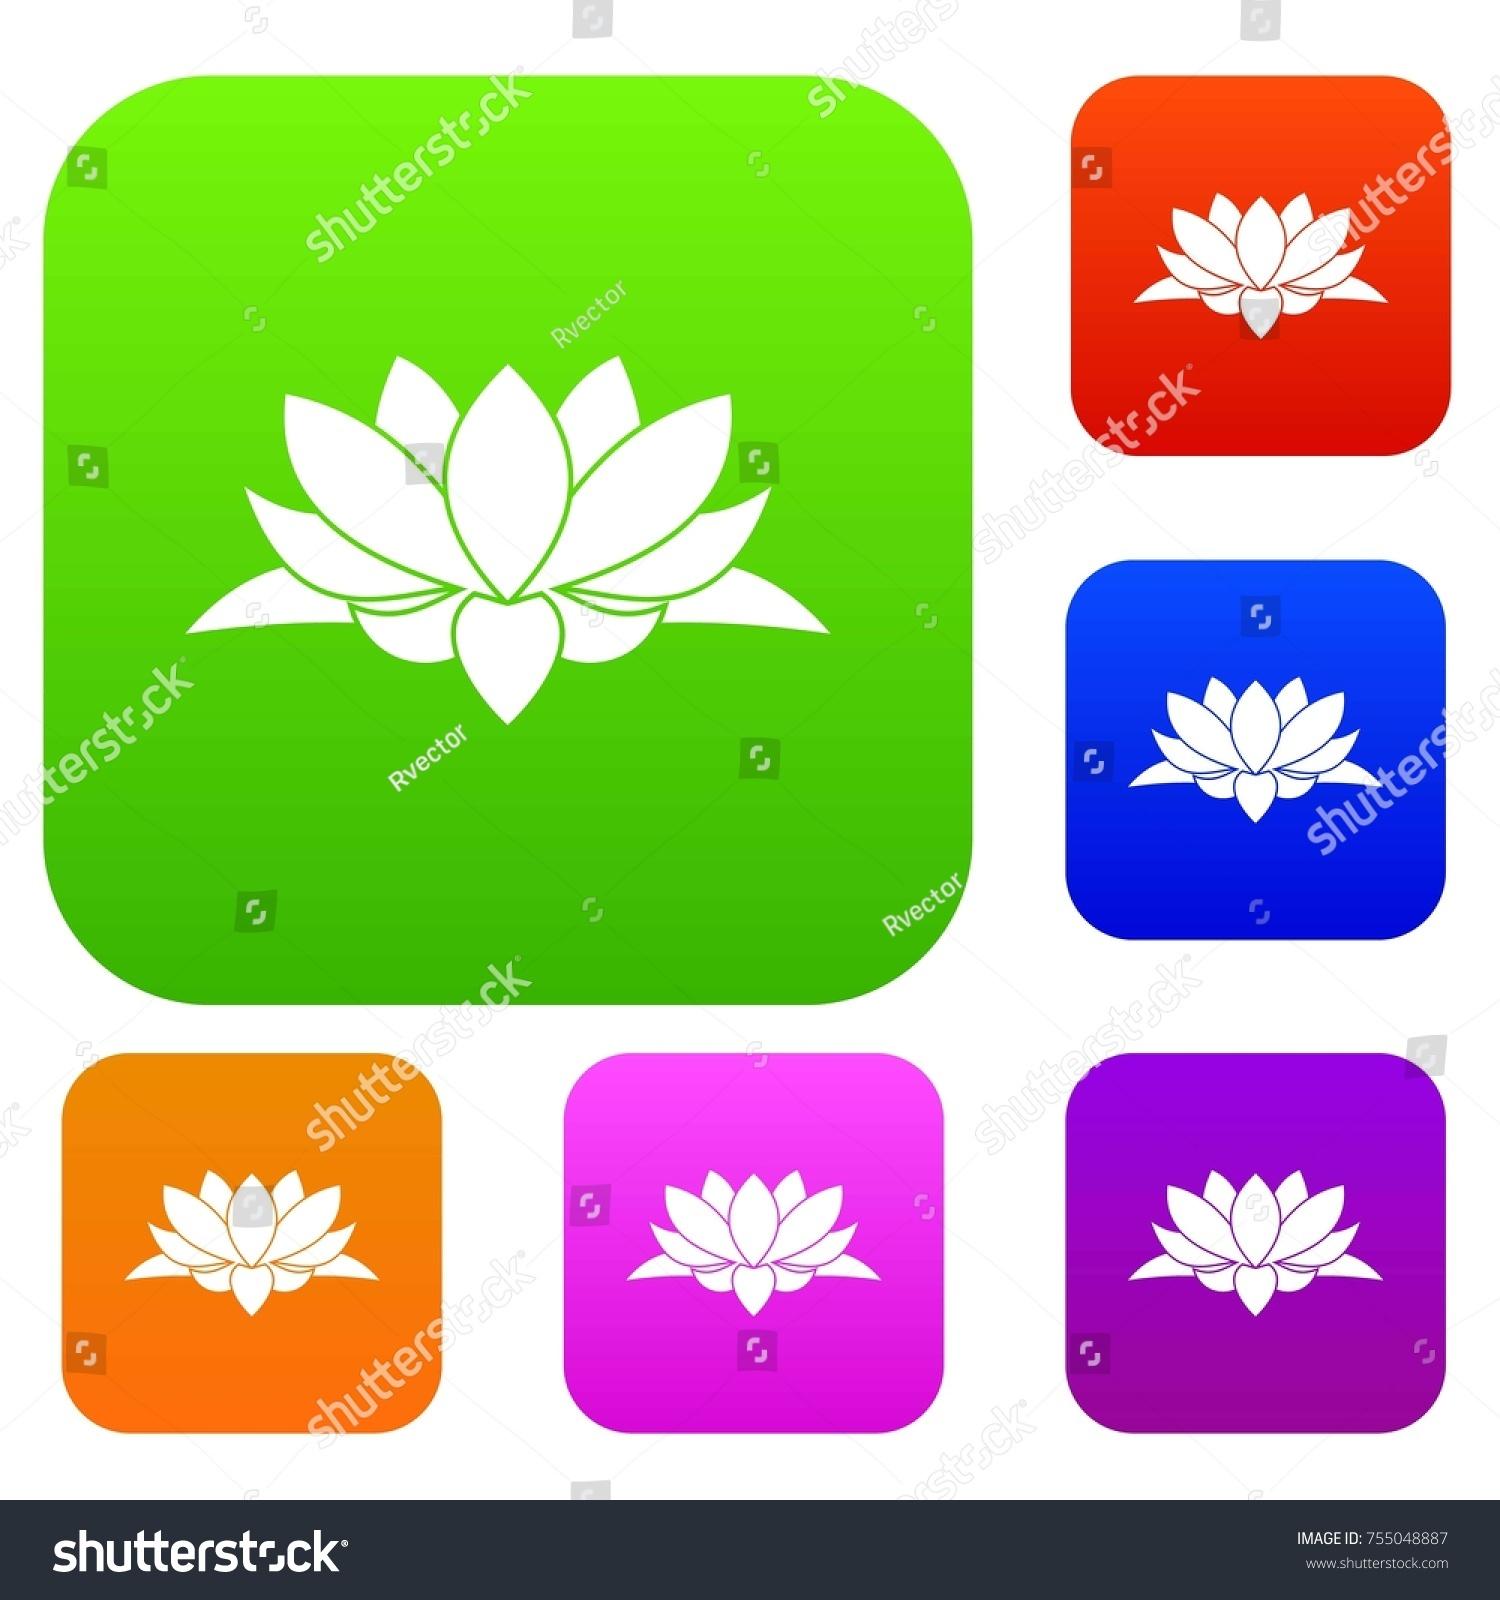 Lotus flower set icon different colors stock illustration 755048887 lotus flower set icon in different colors isolated illustration premium collection izmirmasajfo